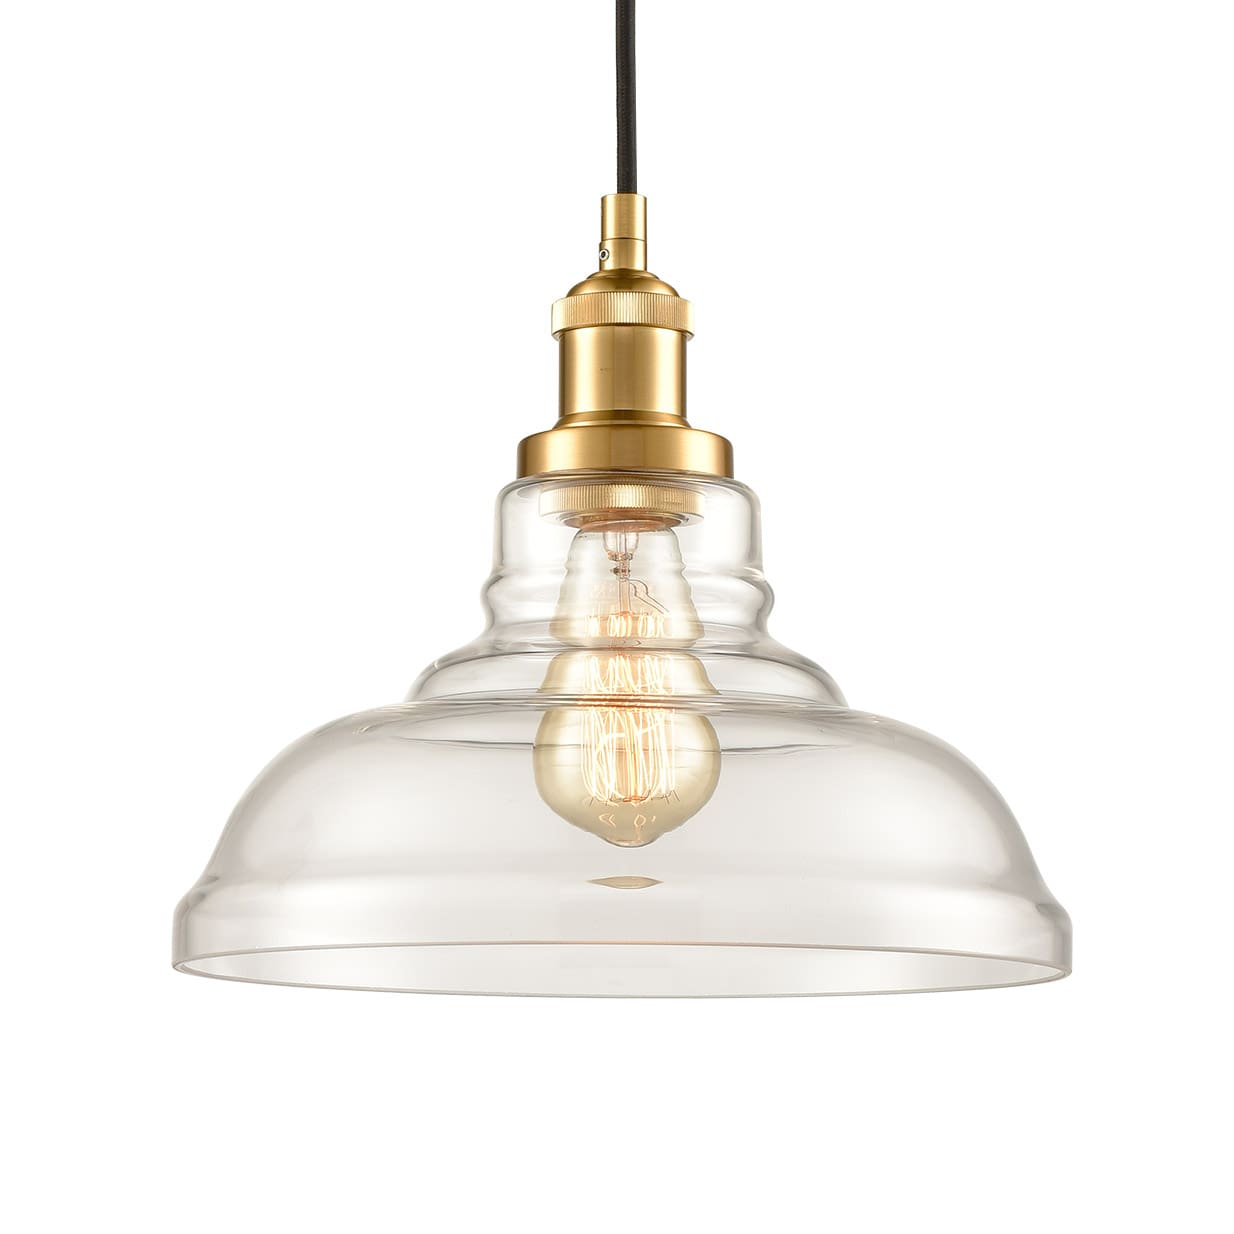 Modern Brass Glass Pendant Lights Barn Shape Kitchen Lamps